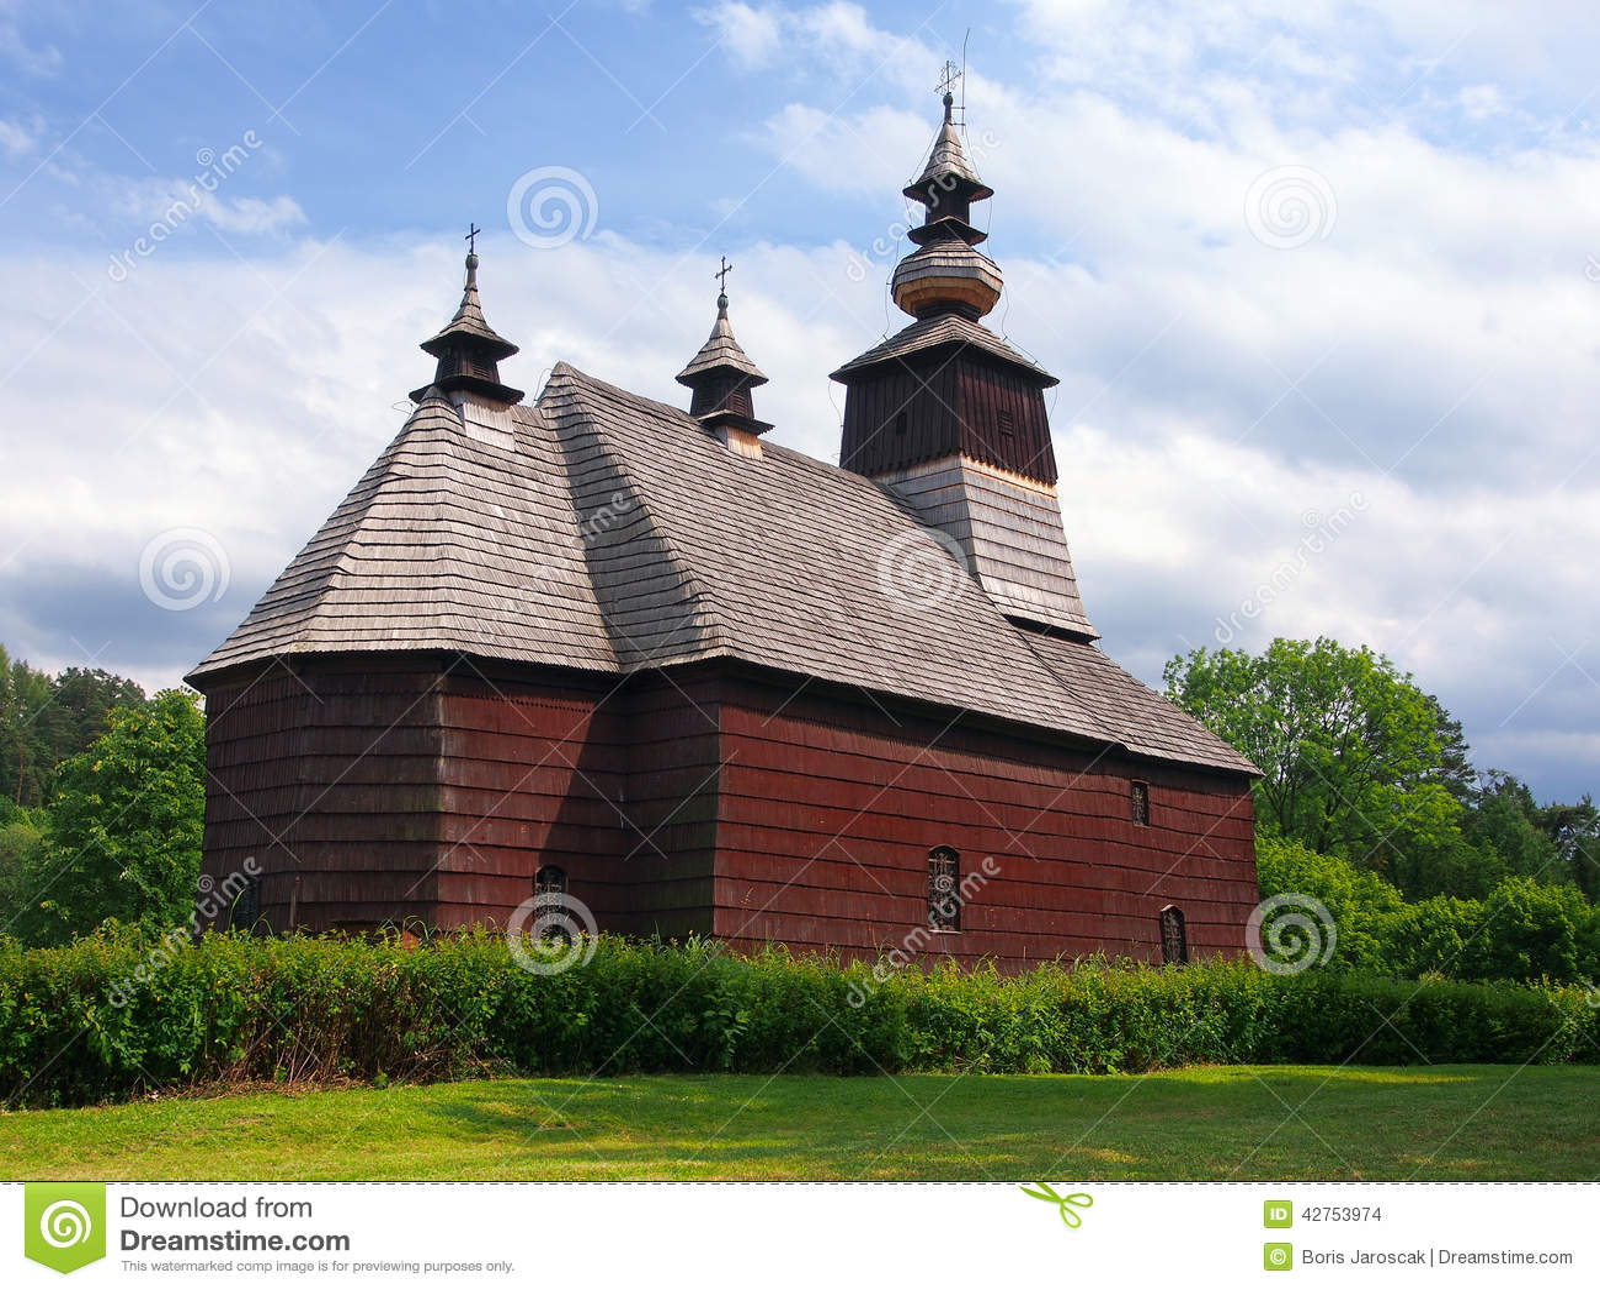 A rare church in Stara Lubovna, Spis, Slovakia